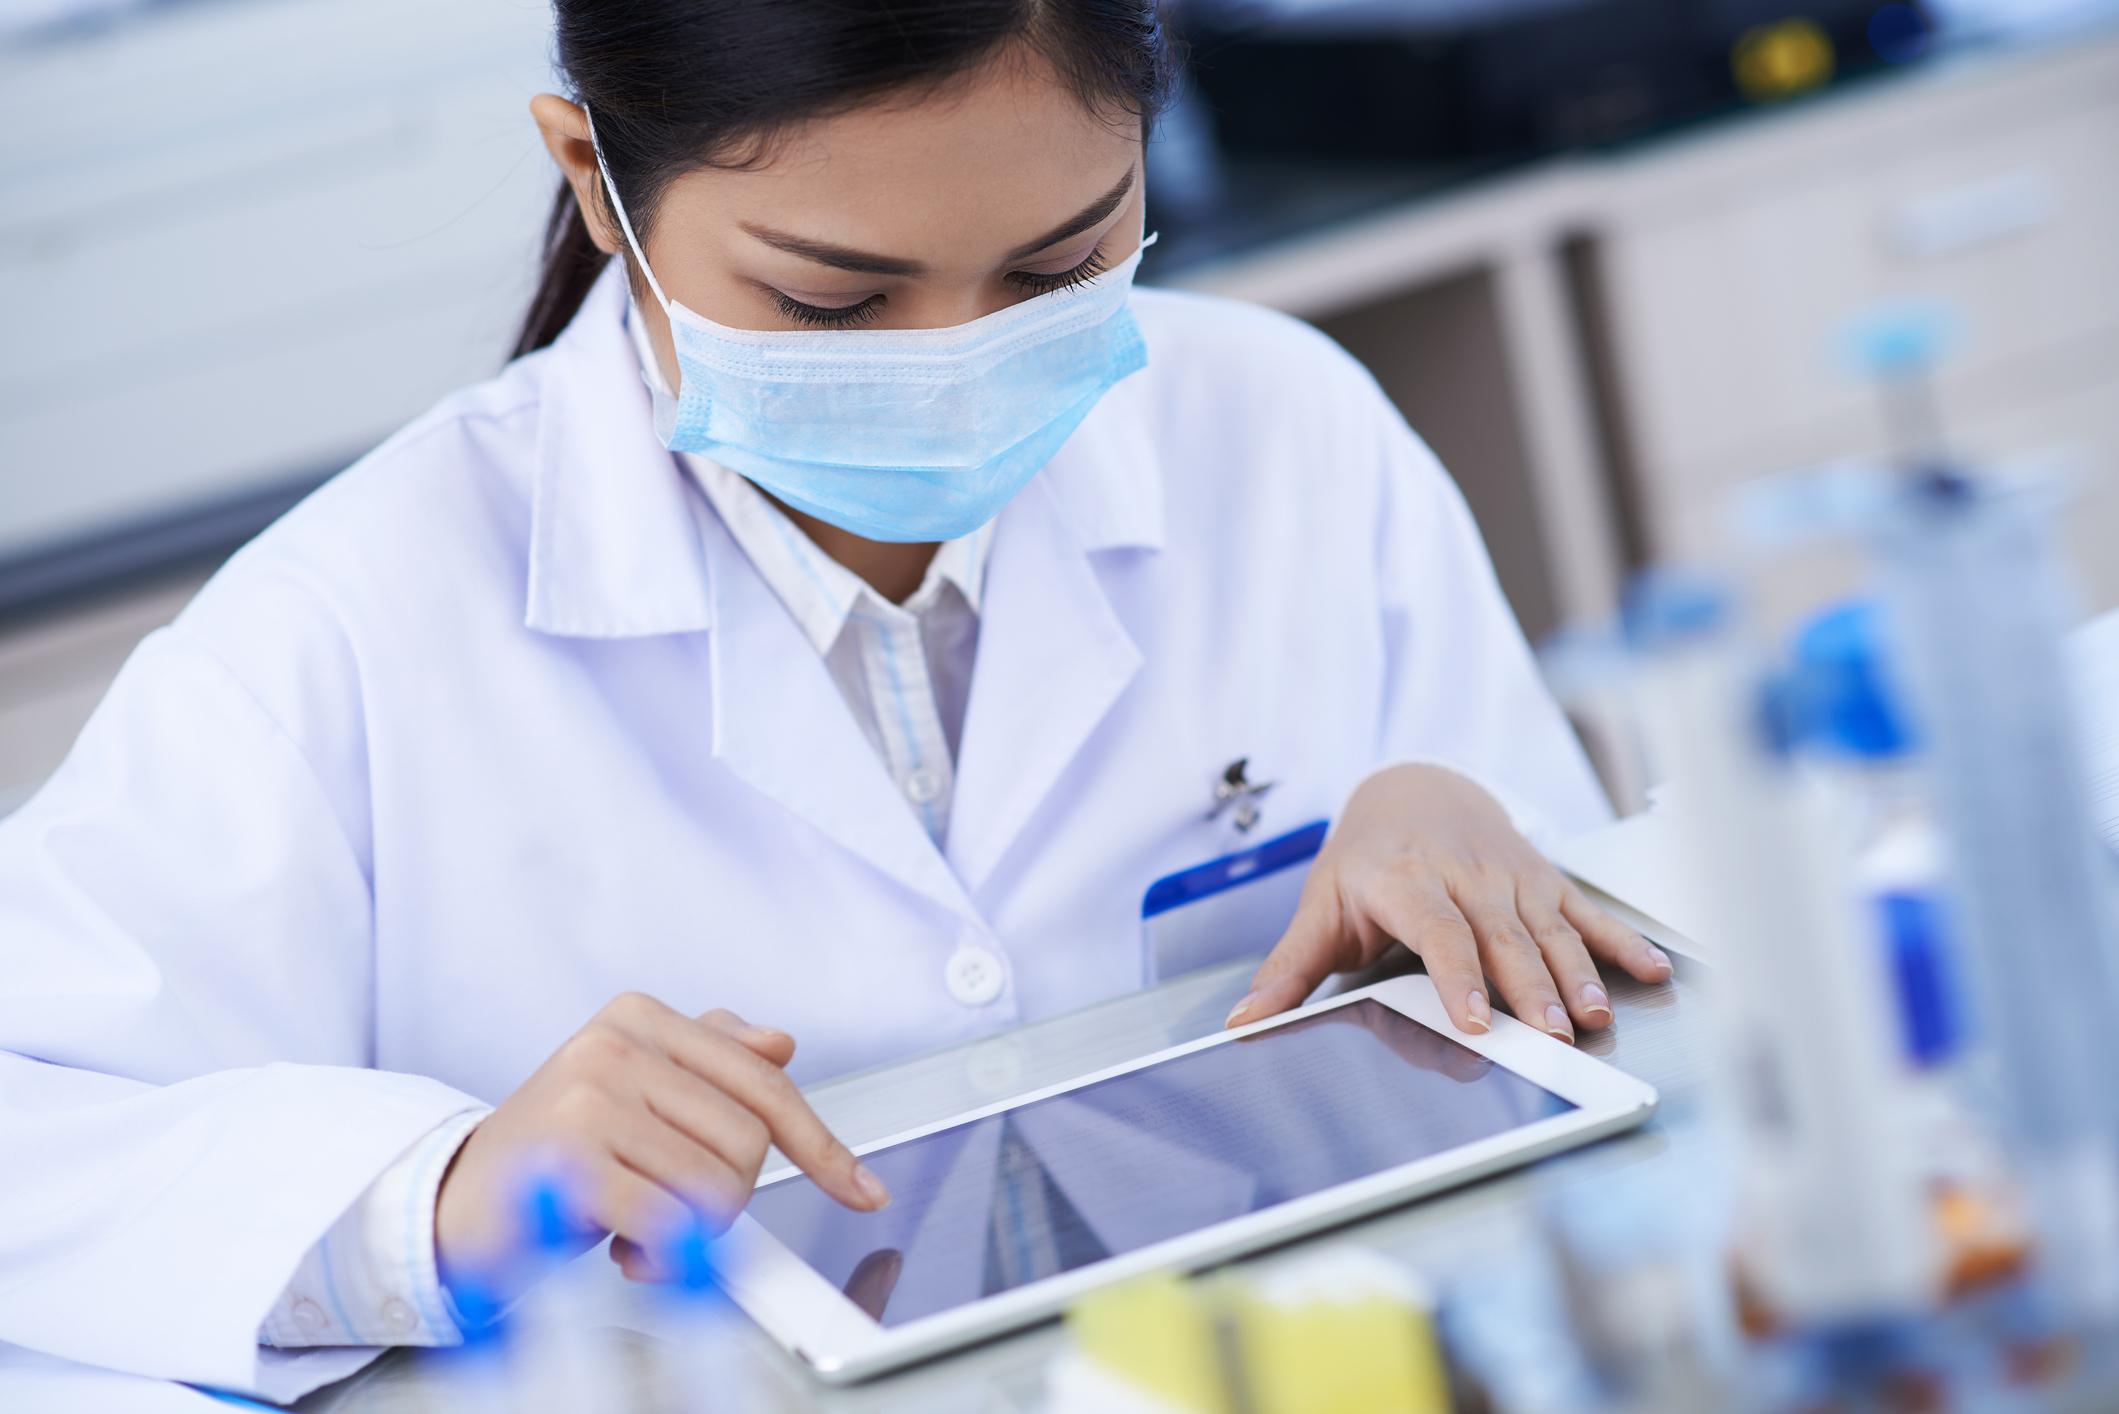 cardiac care data management digital technology